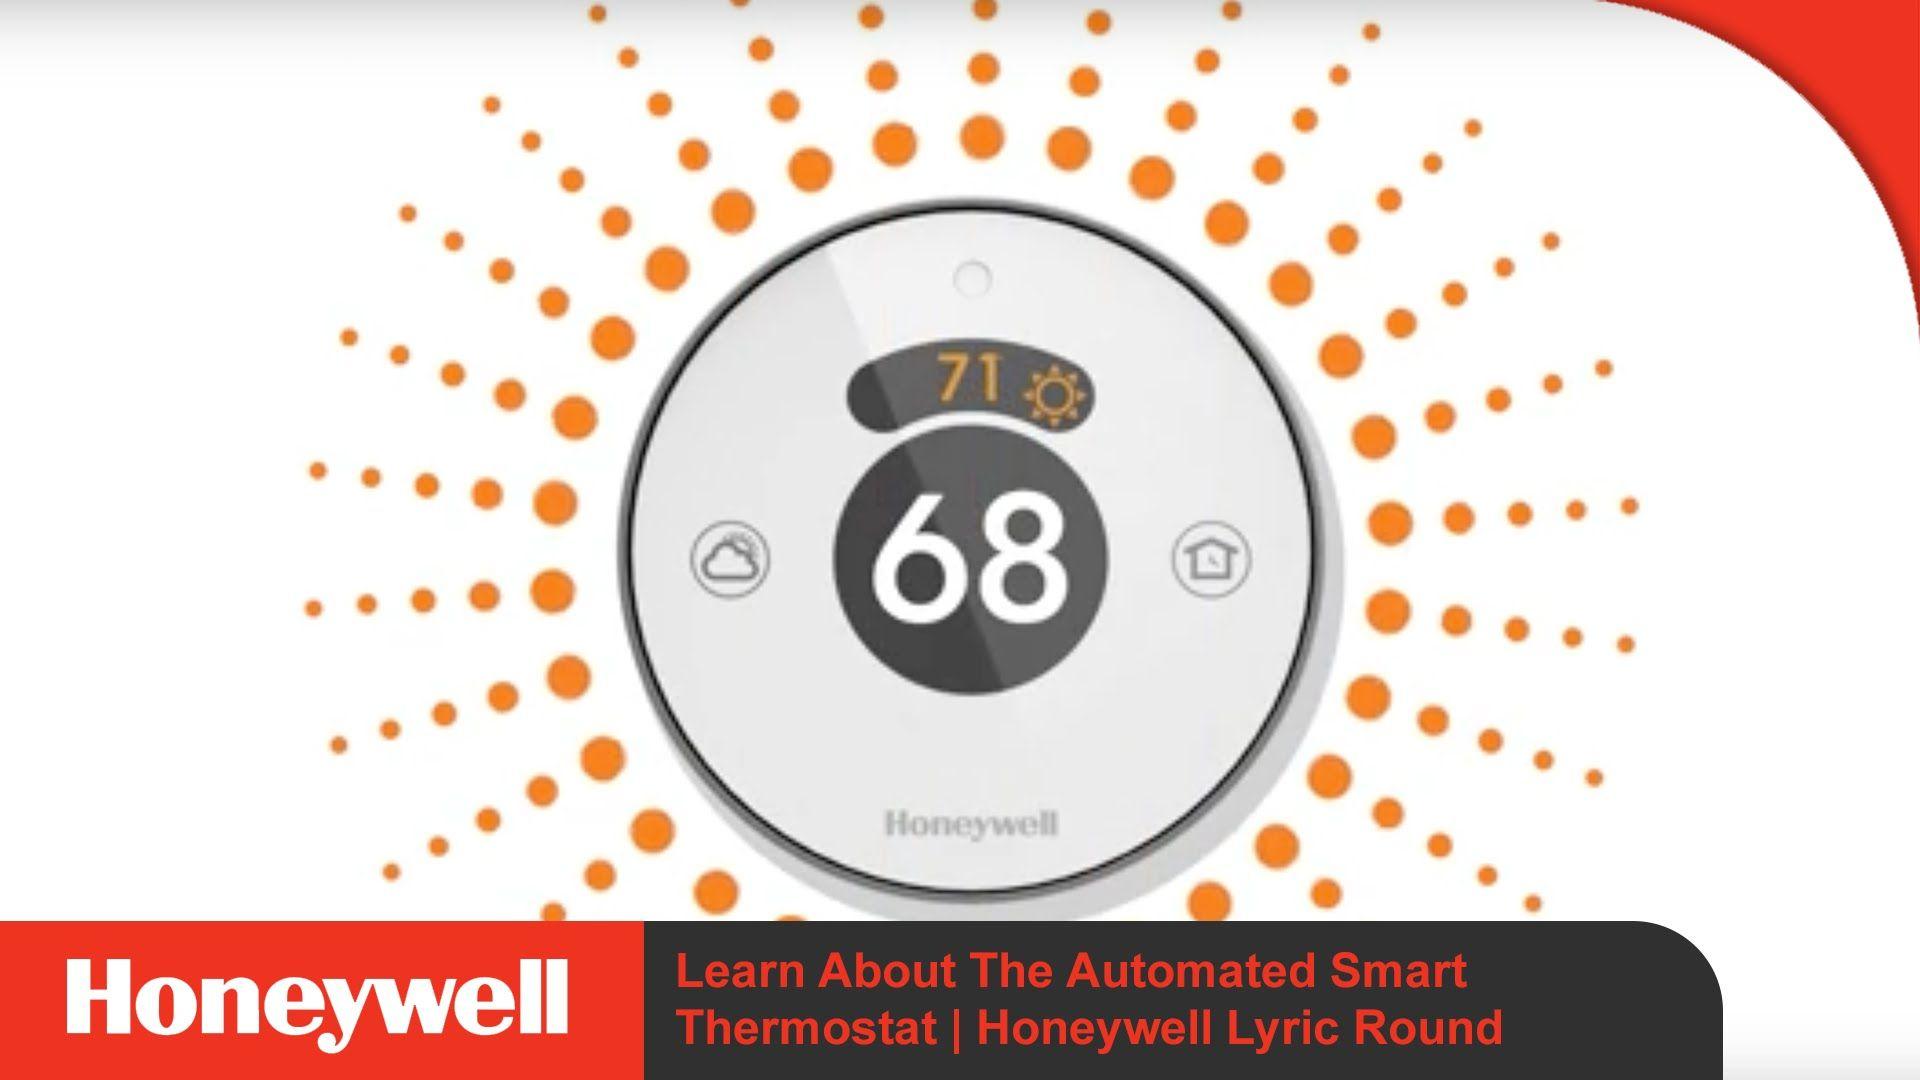 Honeywell Lyric Round Second Generation Thermostat